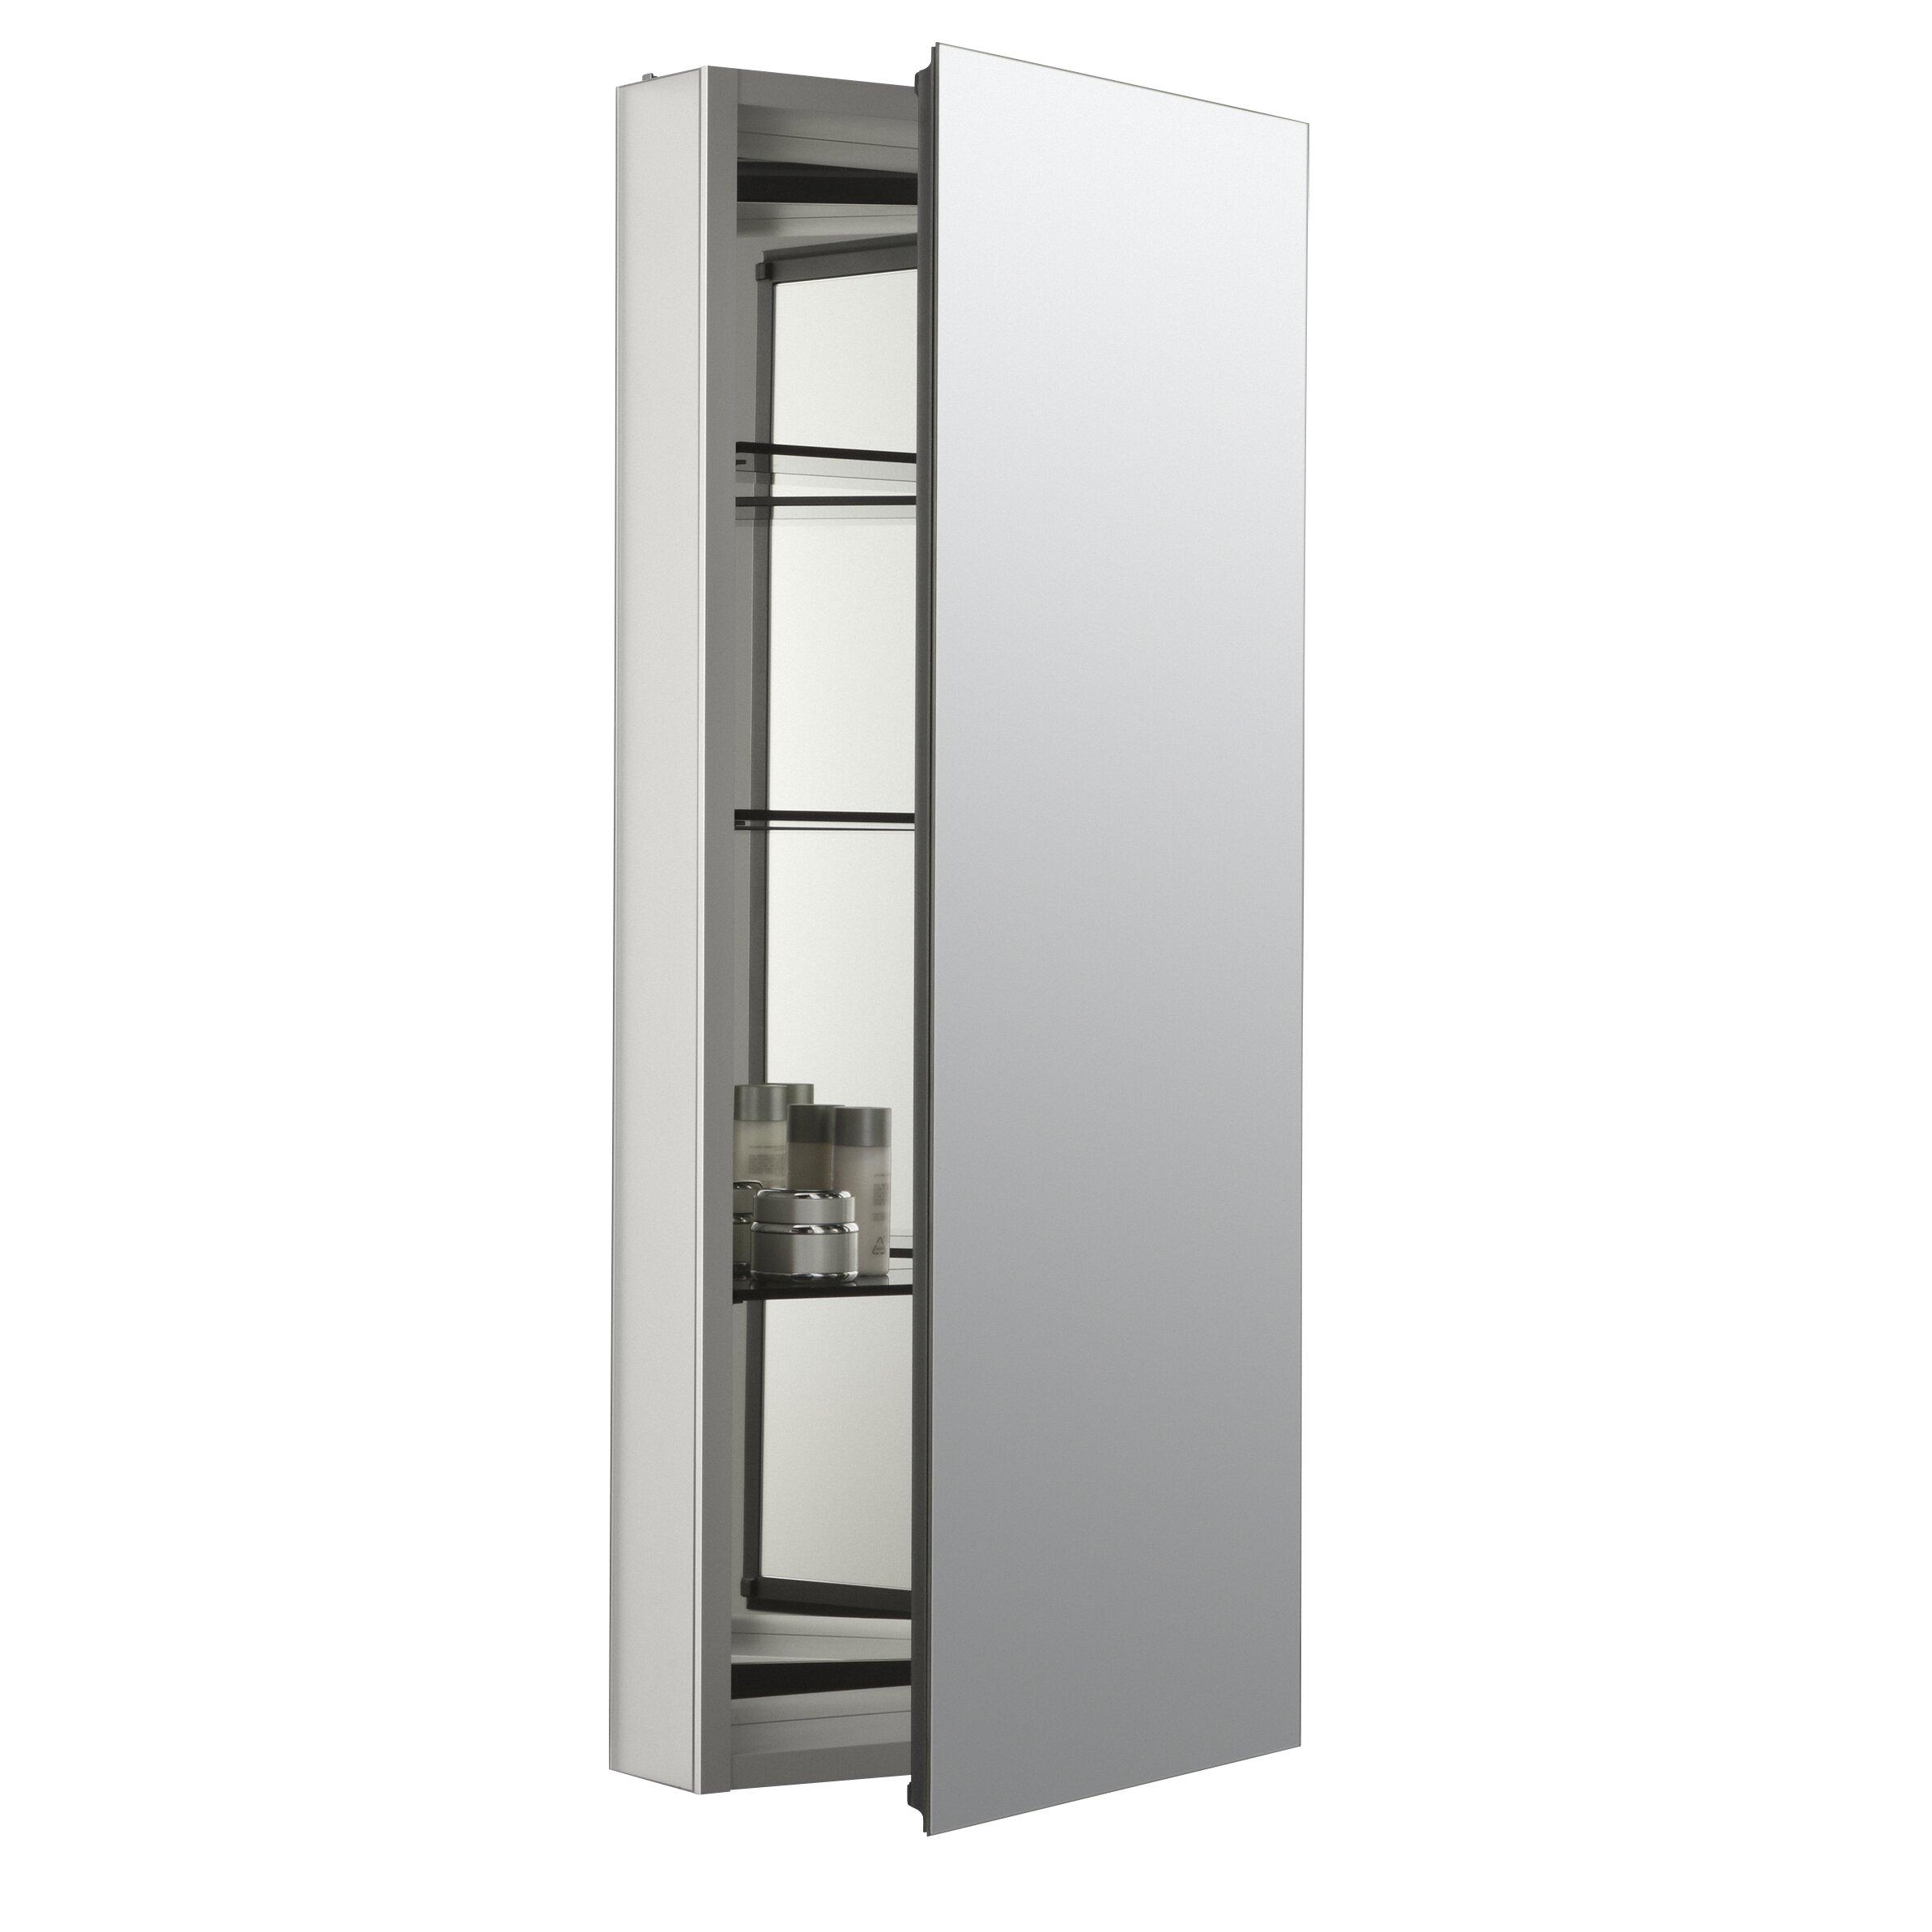 Jensen Medicine Cabinet Kohler Catalan 15 W X 36 H Aluminum Single Door Medicine Cabinet